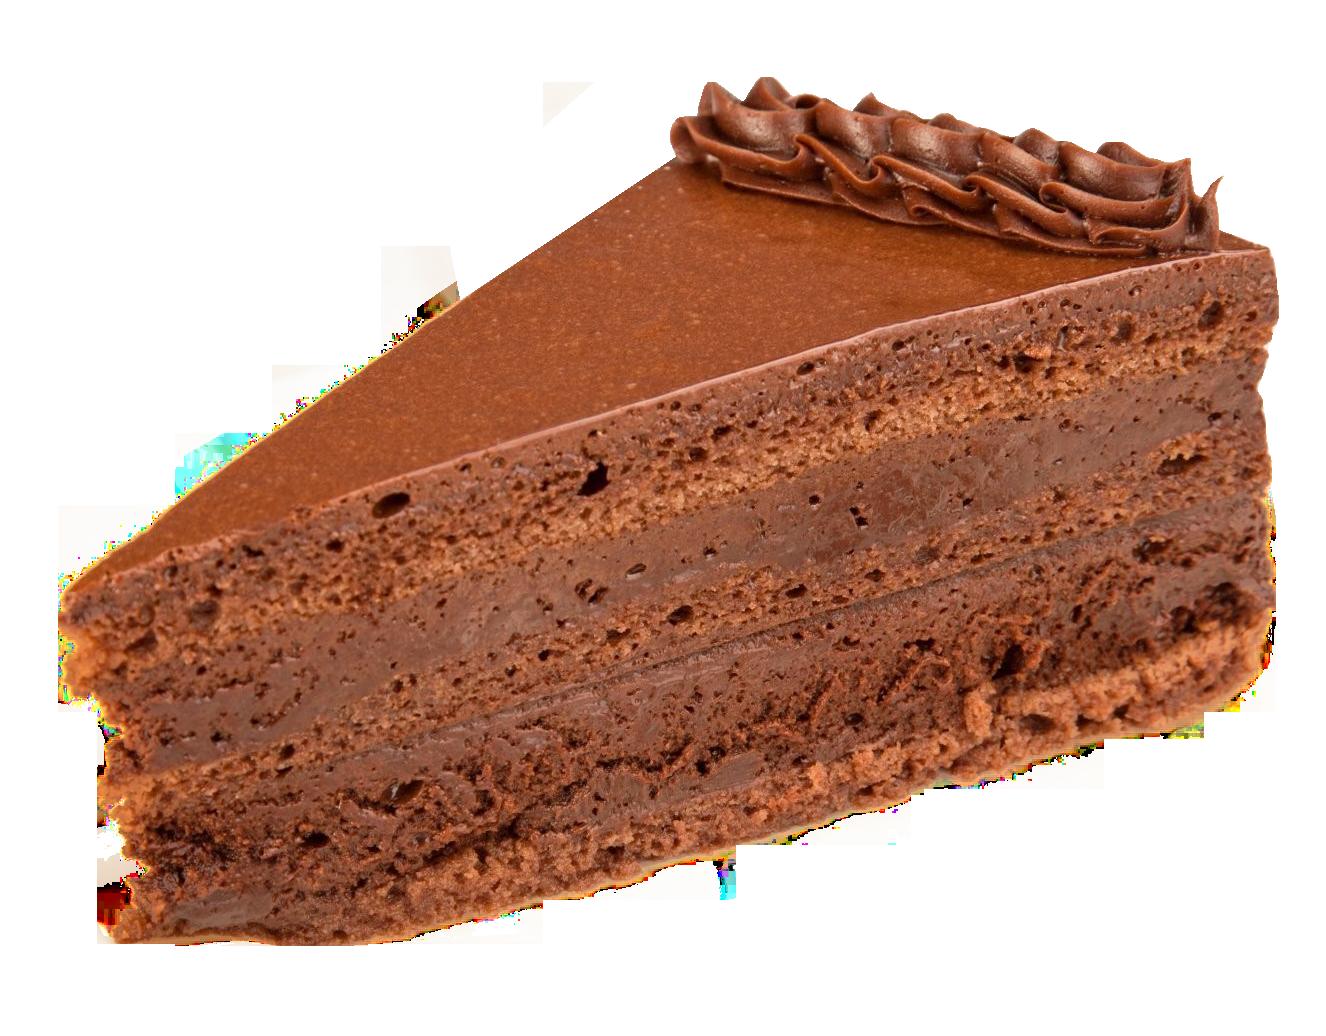 Graphics Of Of Slice Off Cake